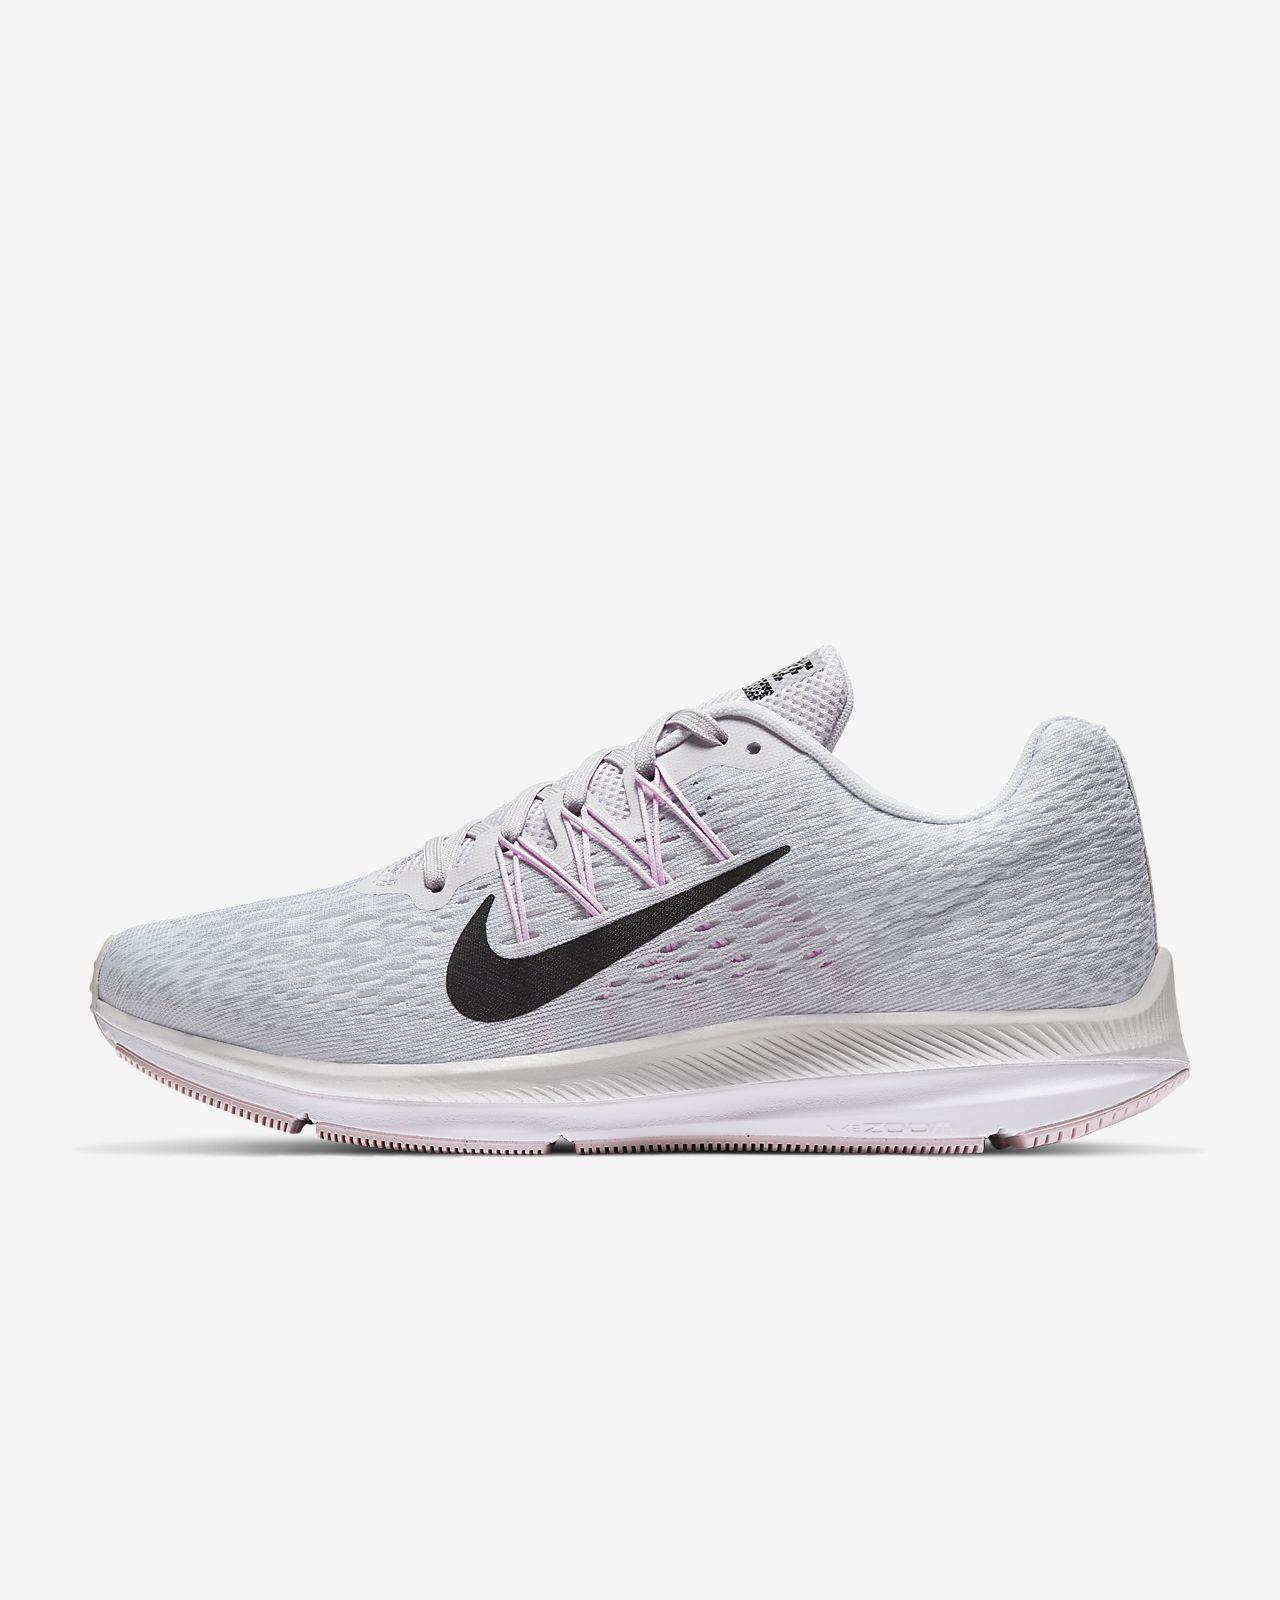 Nike Pegasus 35 And Winflo 5 Nike Air Zoom Winflo 5 Women's Running Shoe. Nike LU